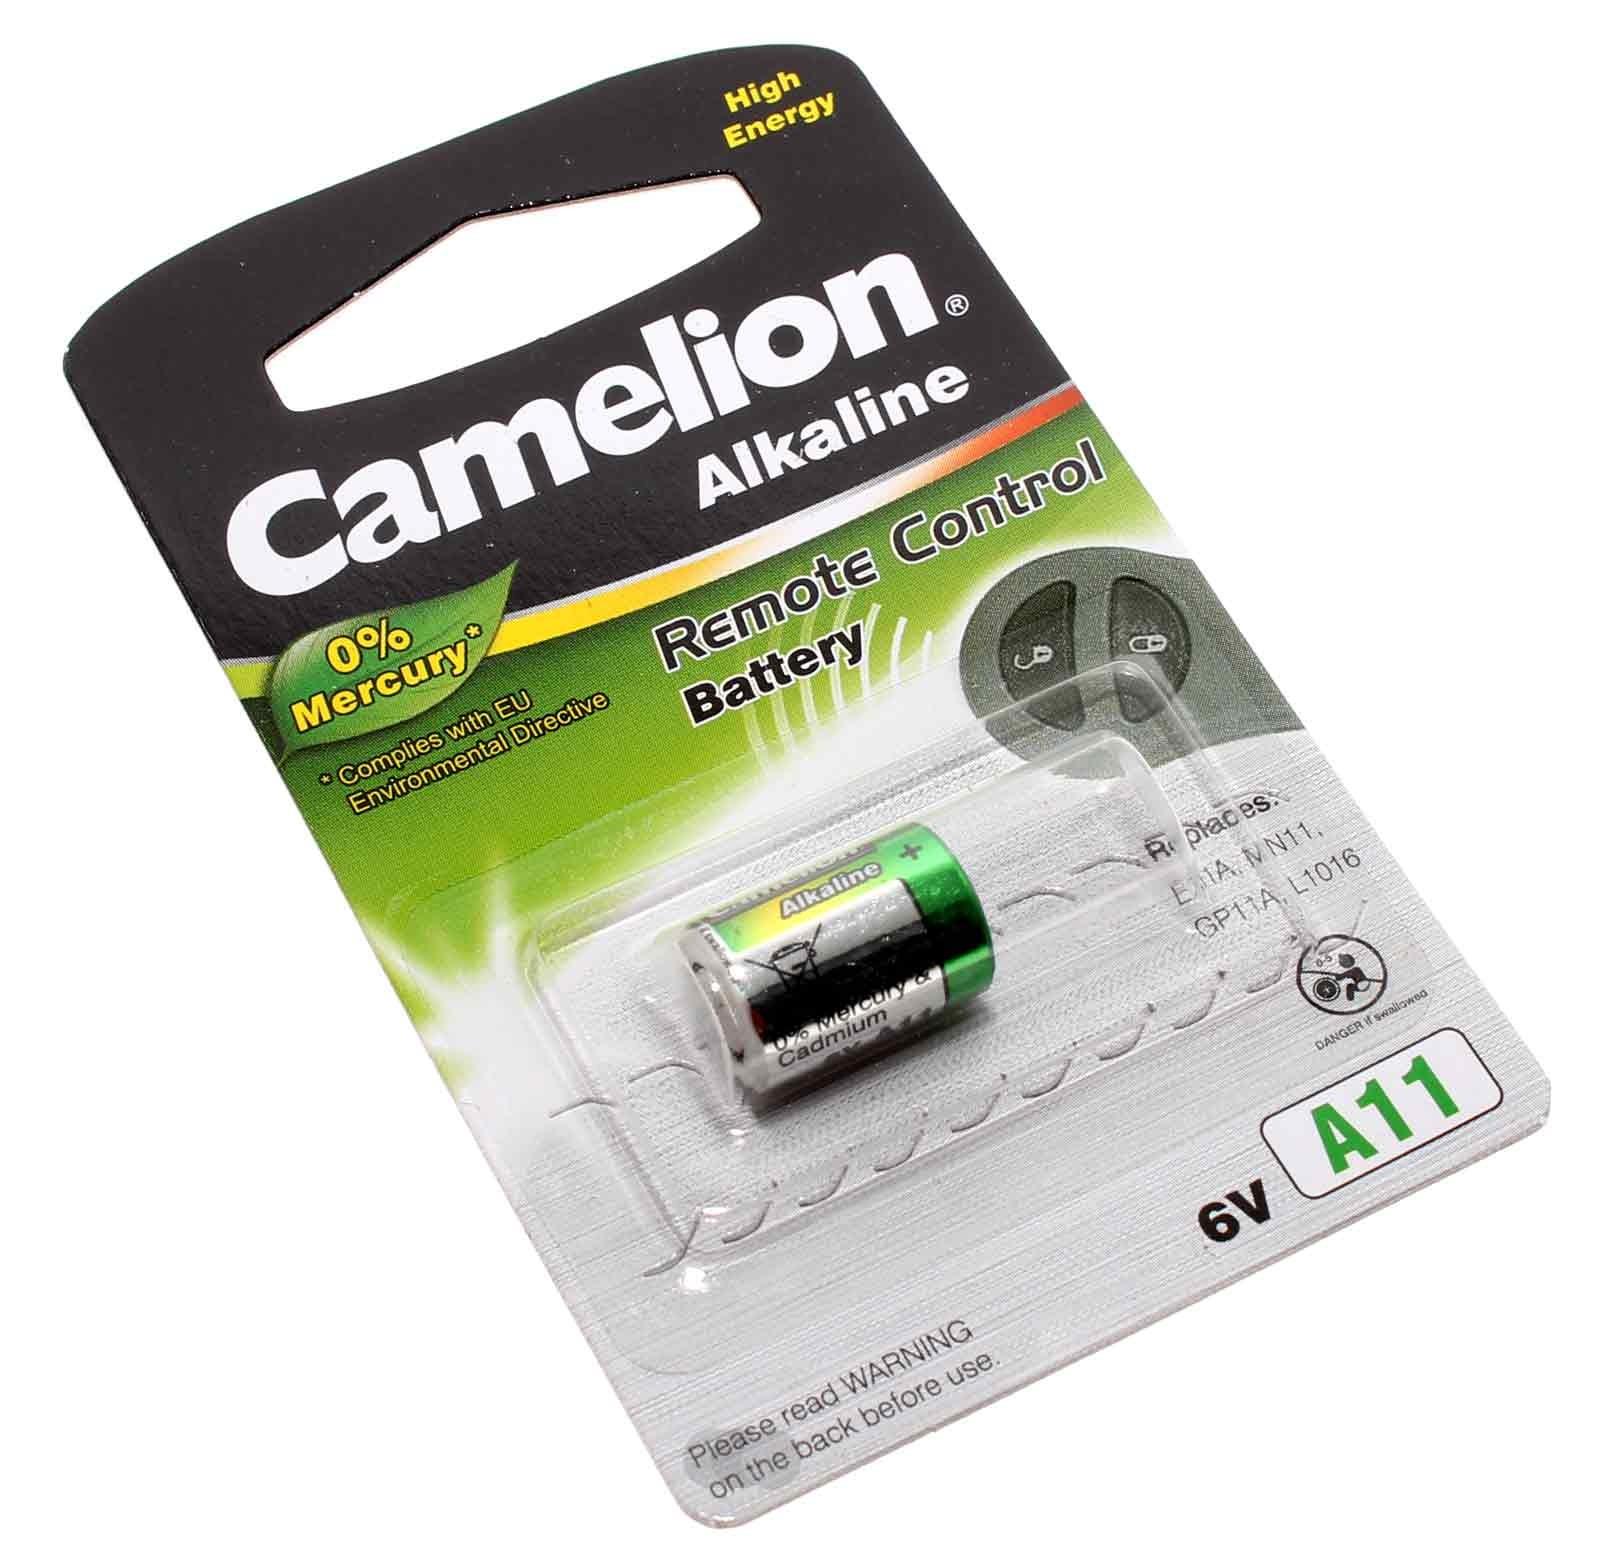 12V Camelion A11 Alkaline Remote Control Fernbedienung Batterie, 38mAh, wie LR11A, E11A, G11A, V11A